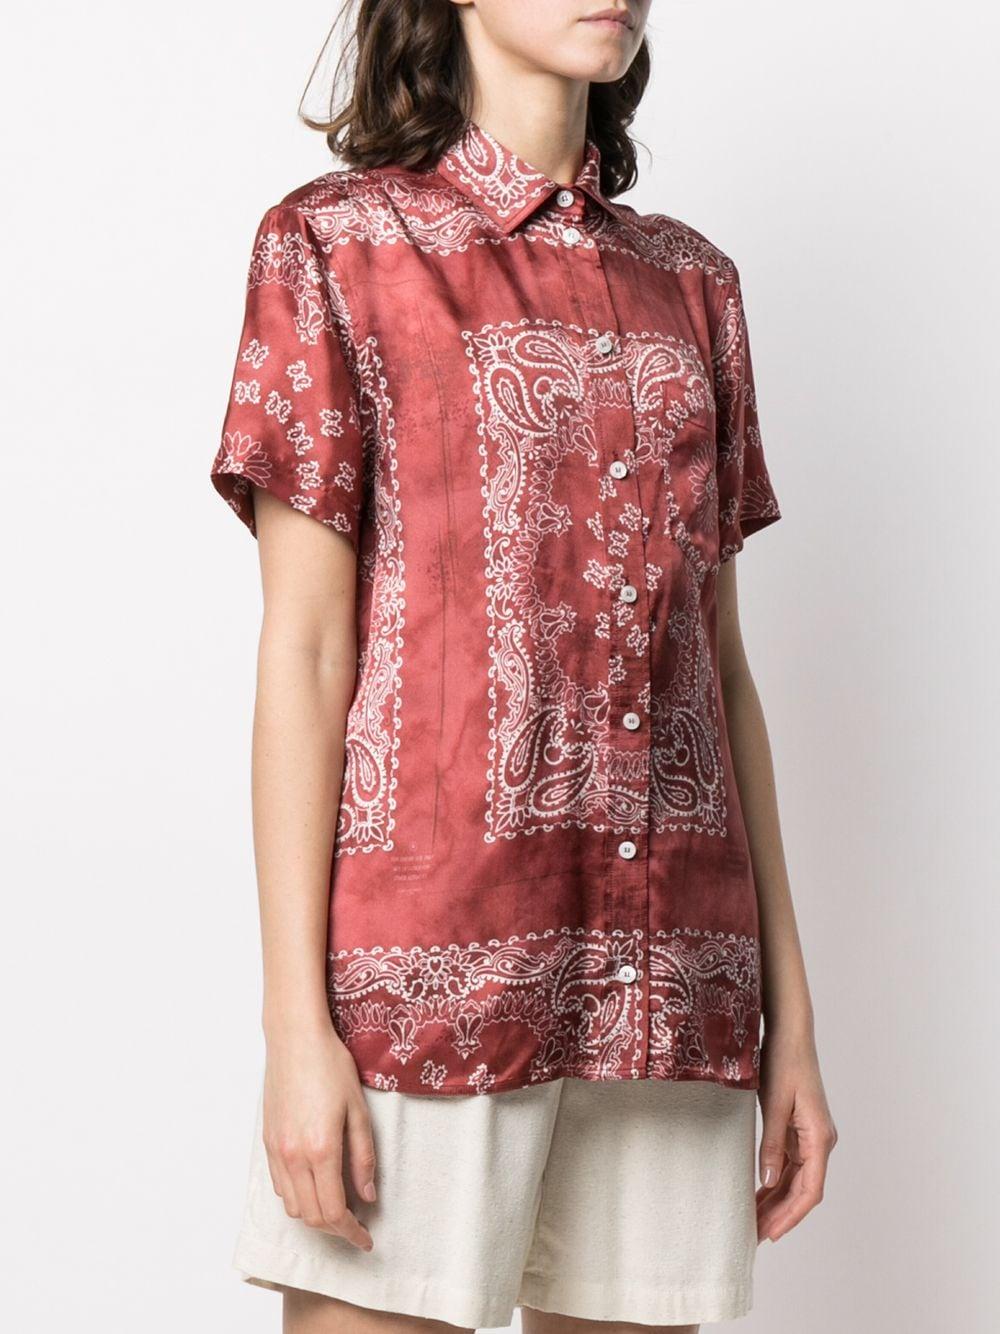 Picture of Golden Goose Deluxe Brand | Bandana Print Fluid Shirt